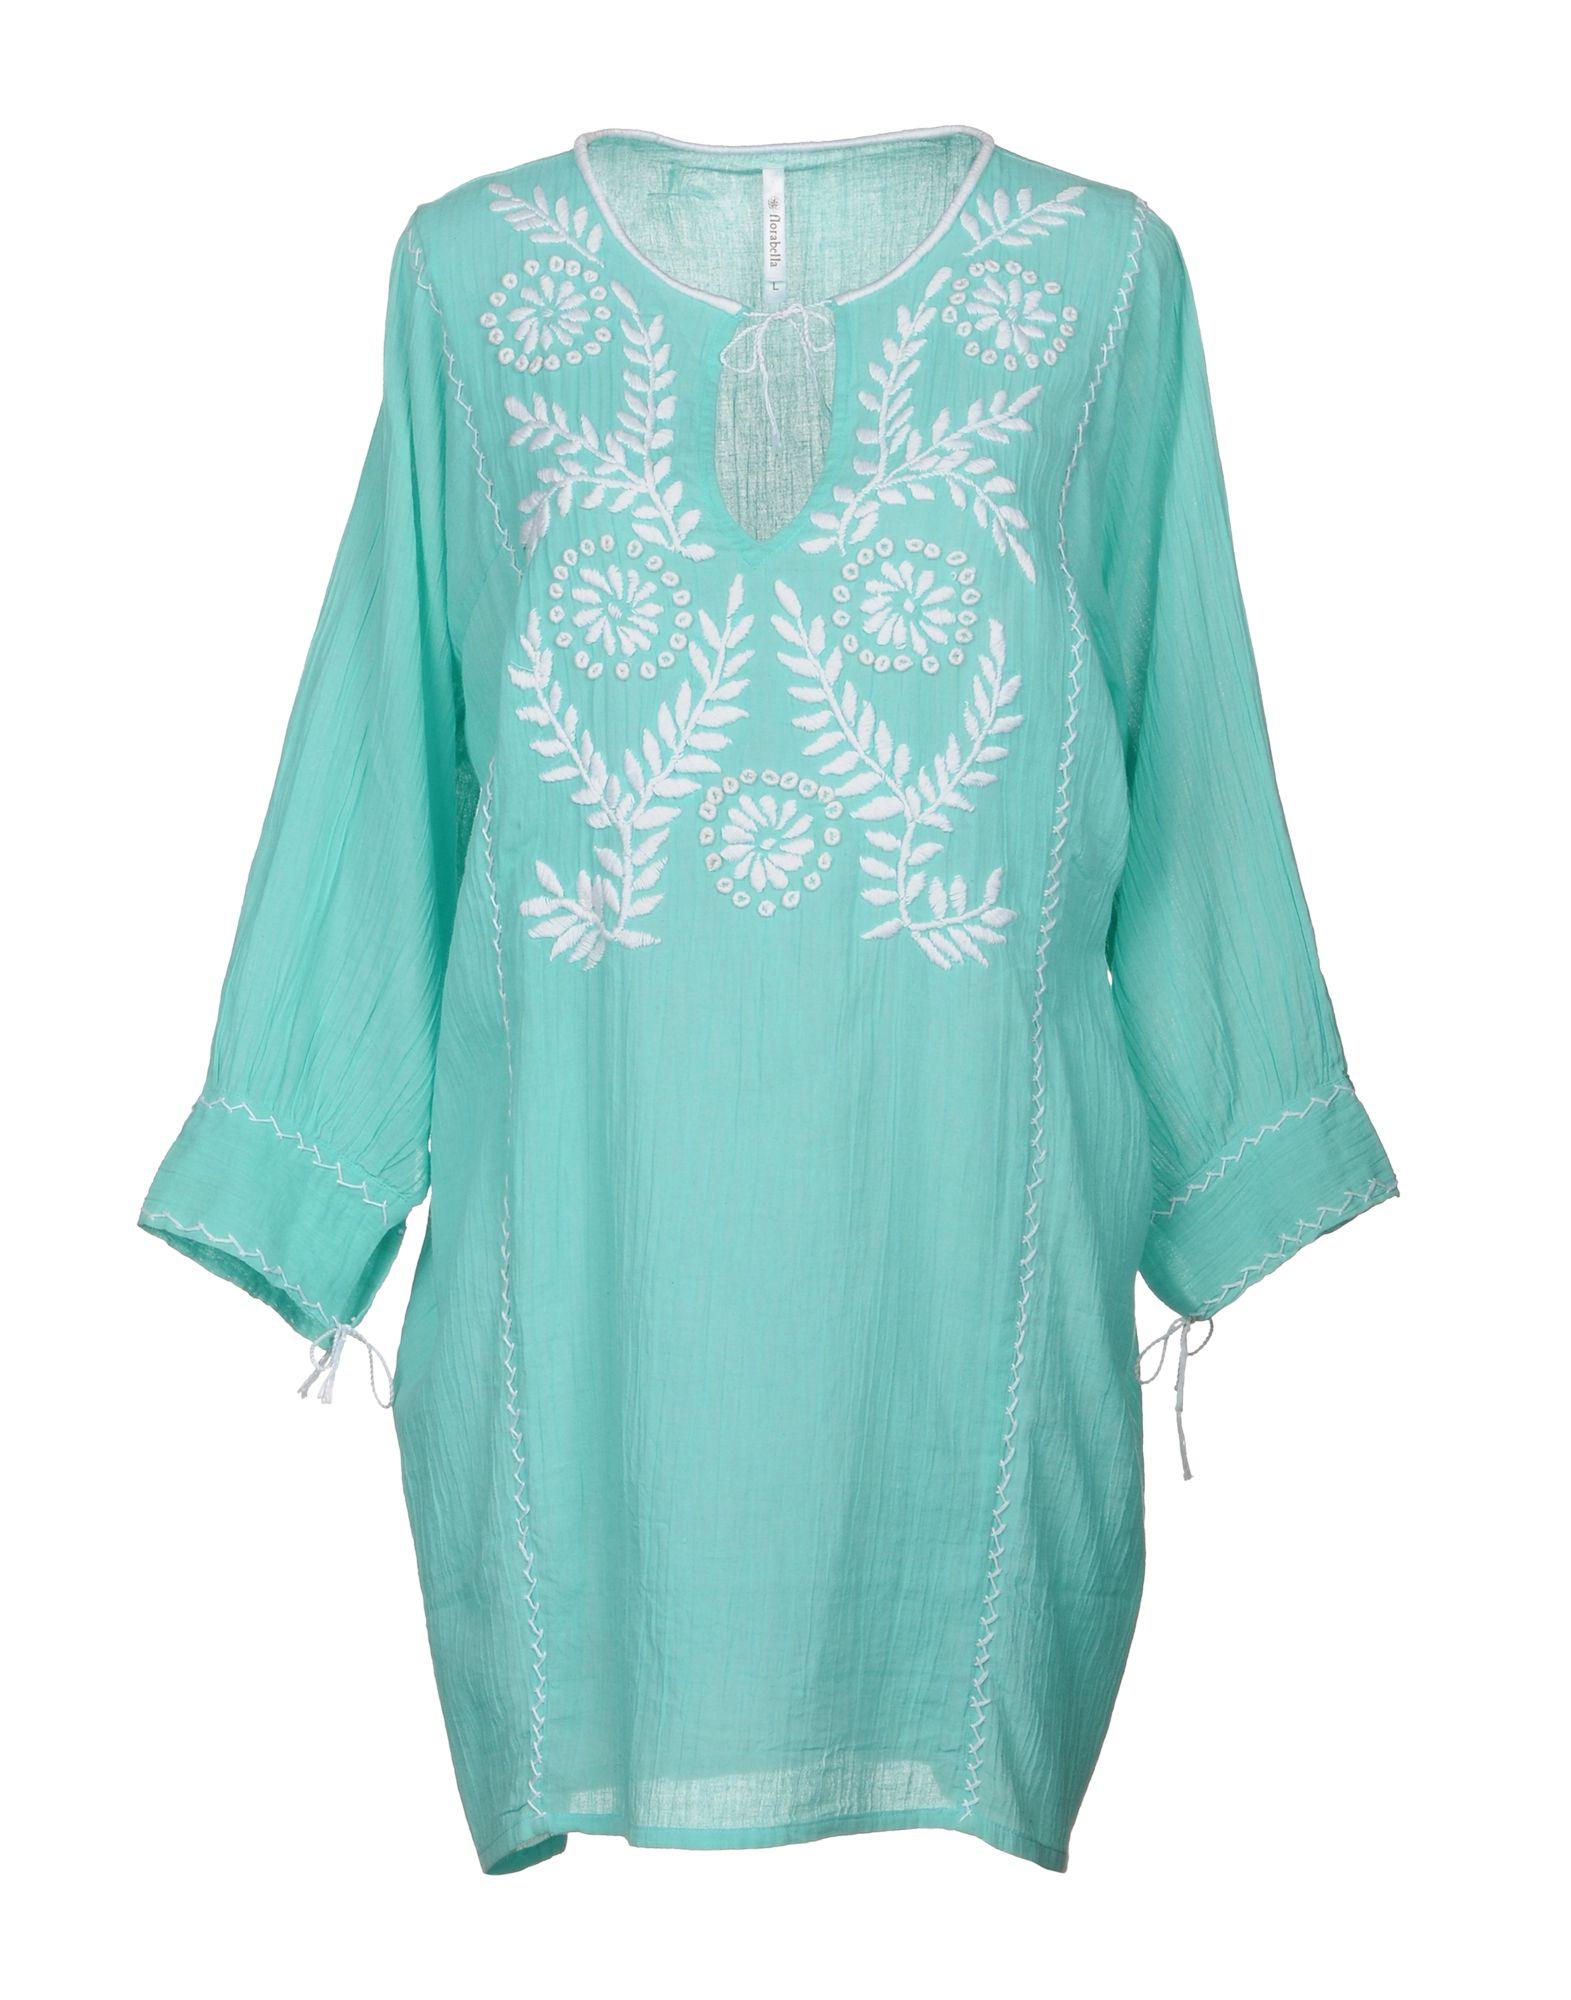 FLORABELLA Short Dress in Light Green